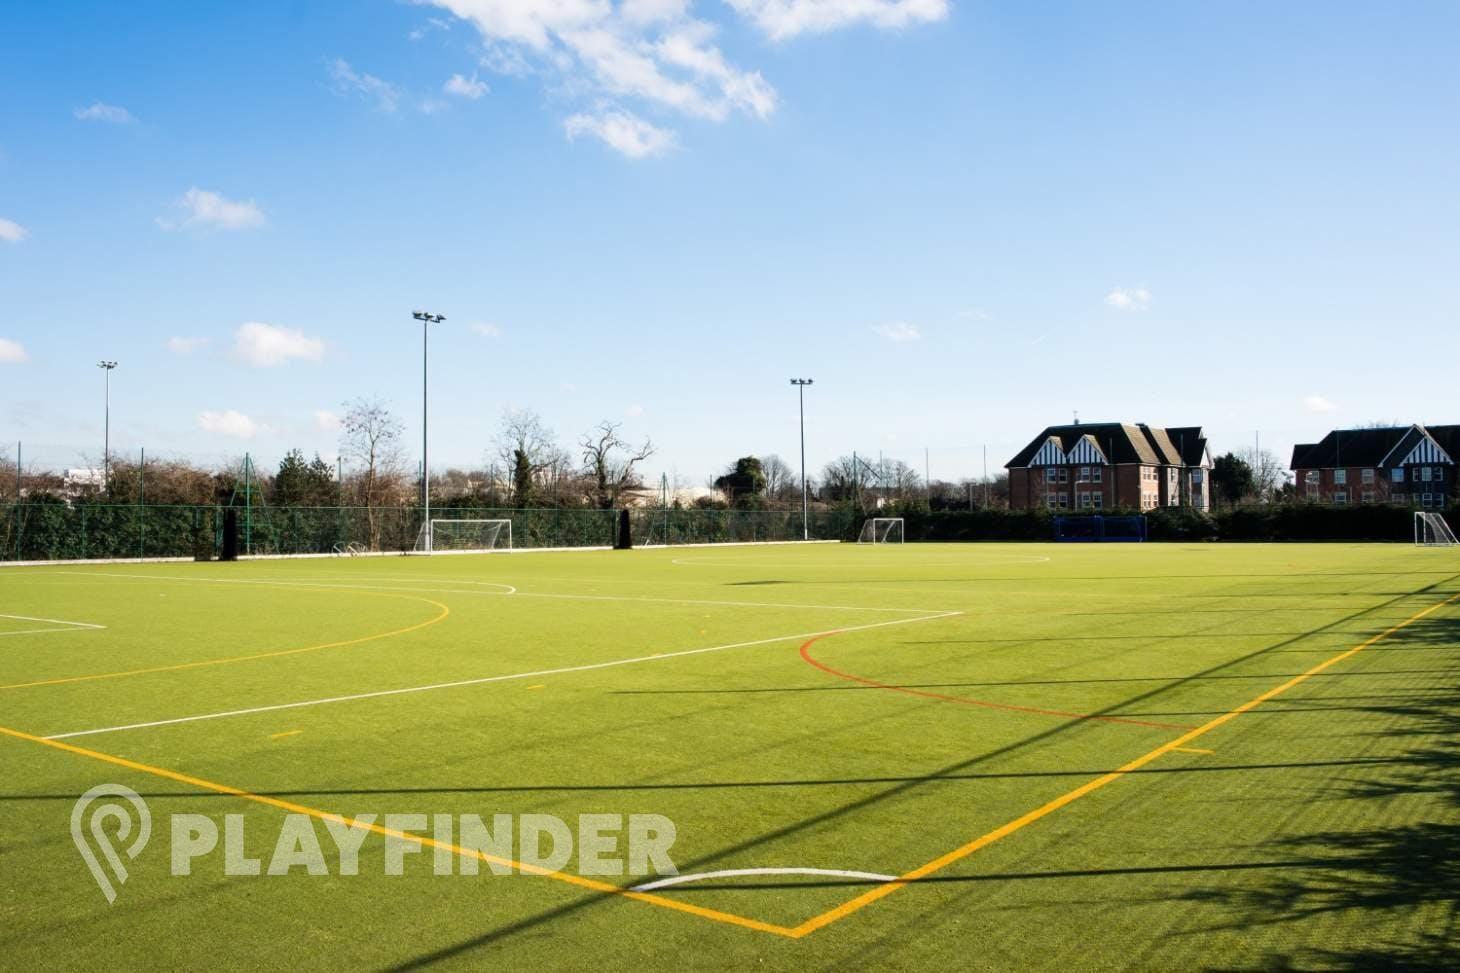 Boddington Gardens 11 a side | 3G Astroturf football pitch